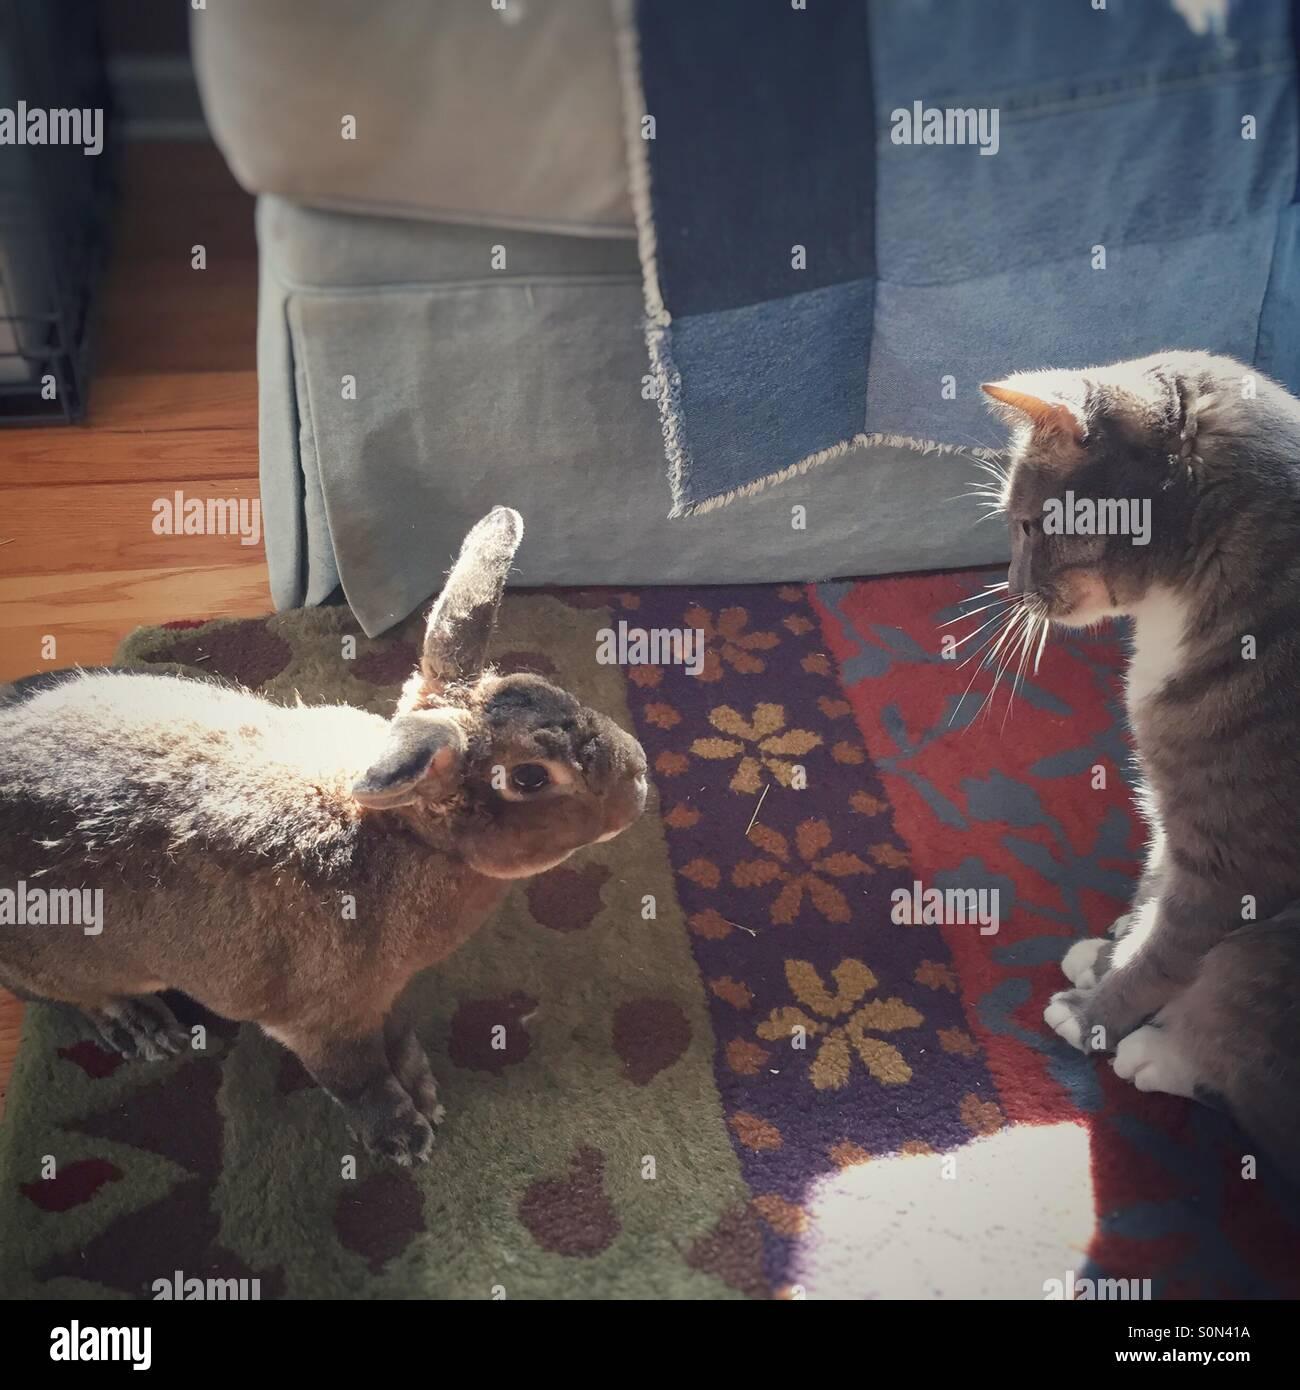 Hase nähert sich vorsichtig Katze. Stockbild